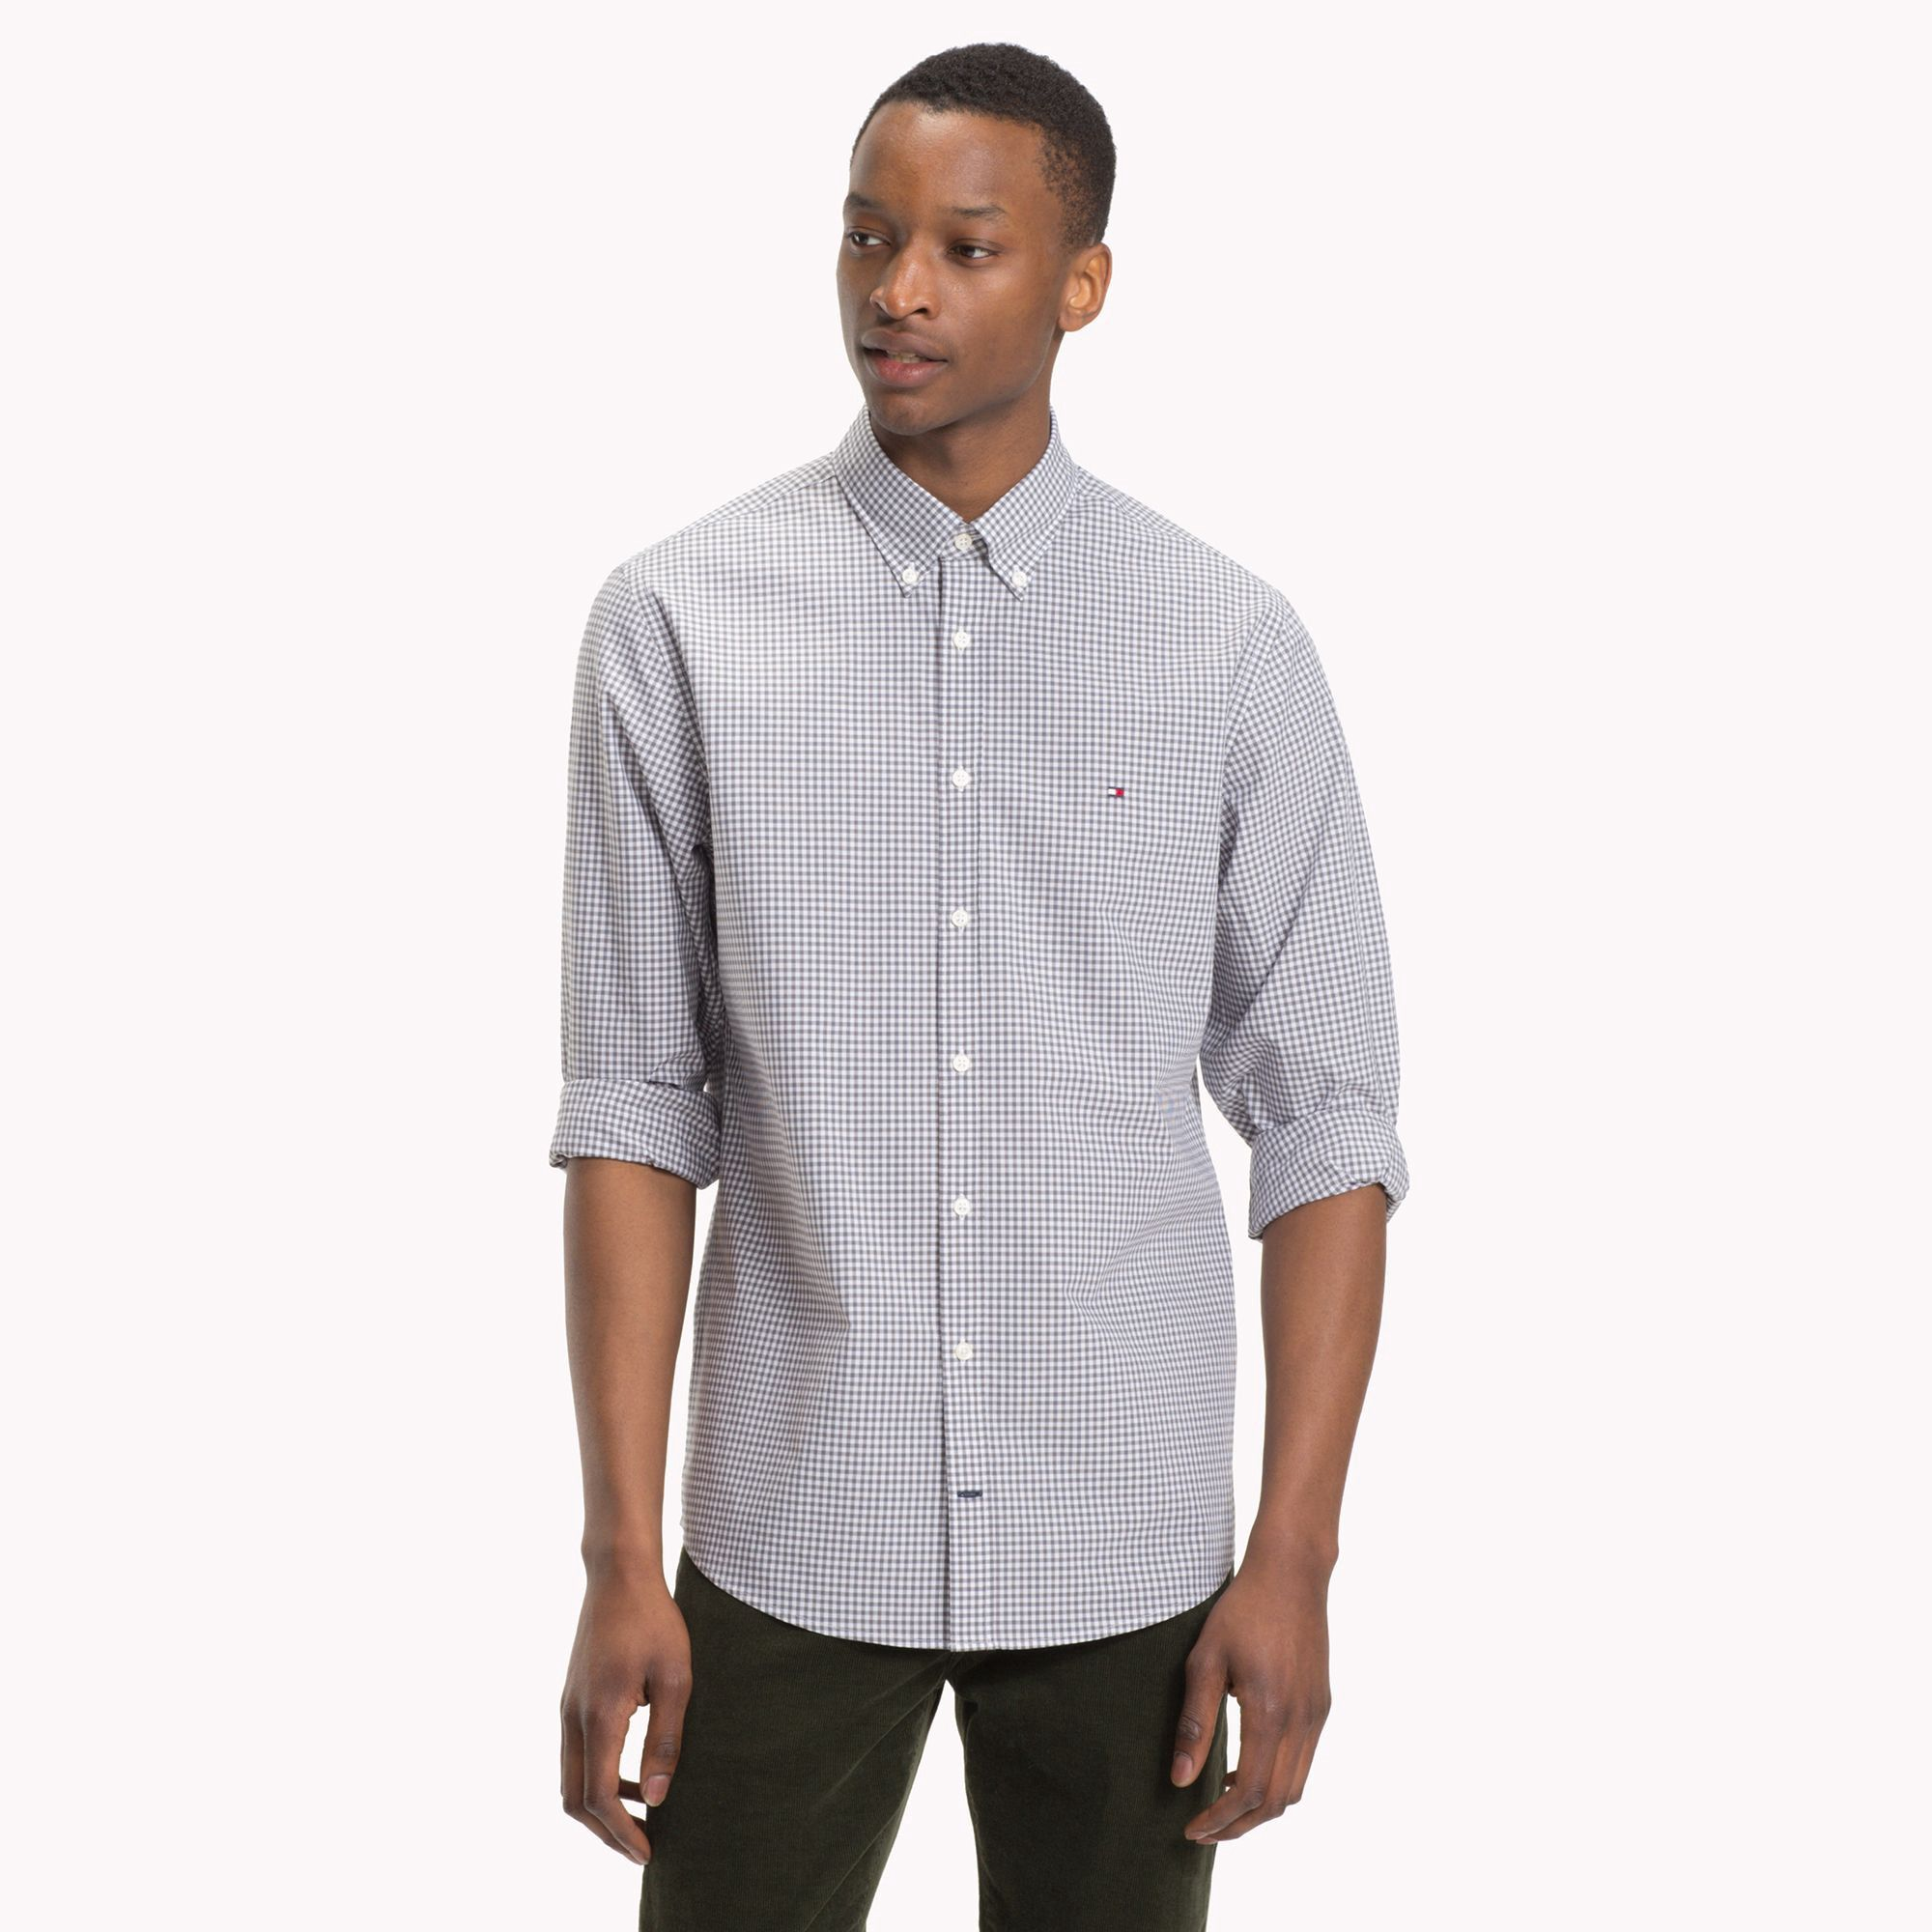 0fab4527 Tommy Hilfiger Cotton Poplin Gingham Shirt - Eiffel Tower / Bright White Xxl